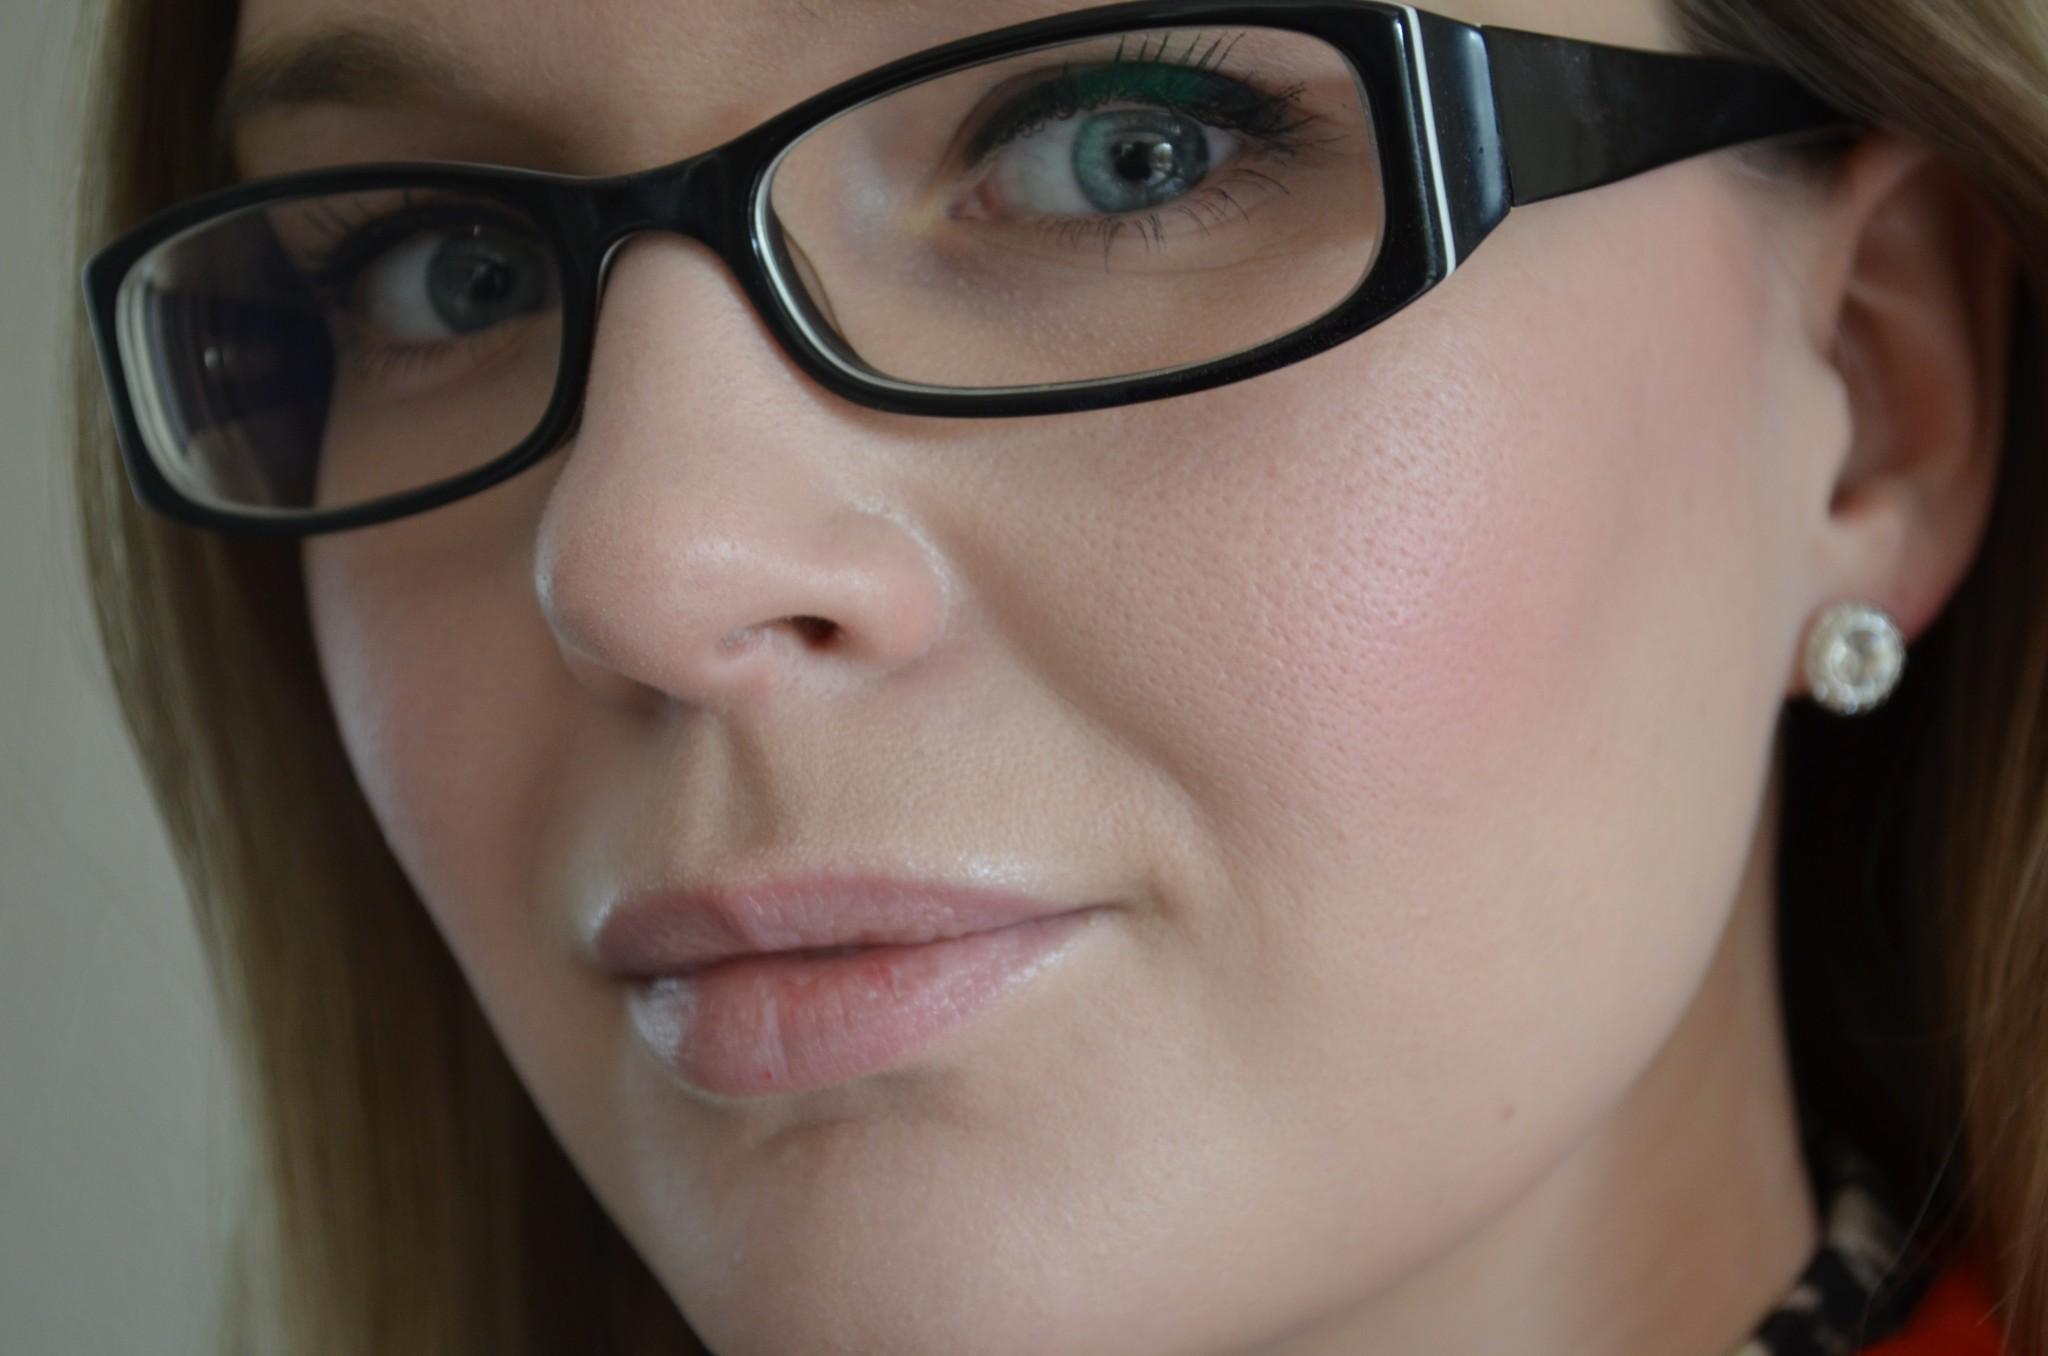 DSC 0264 - Nieuw van Hema! Satin Blush Powder(s) Review